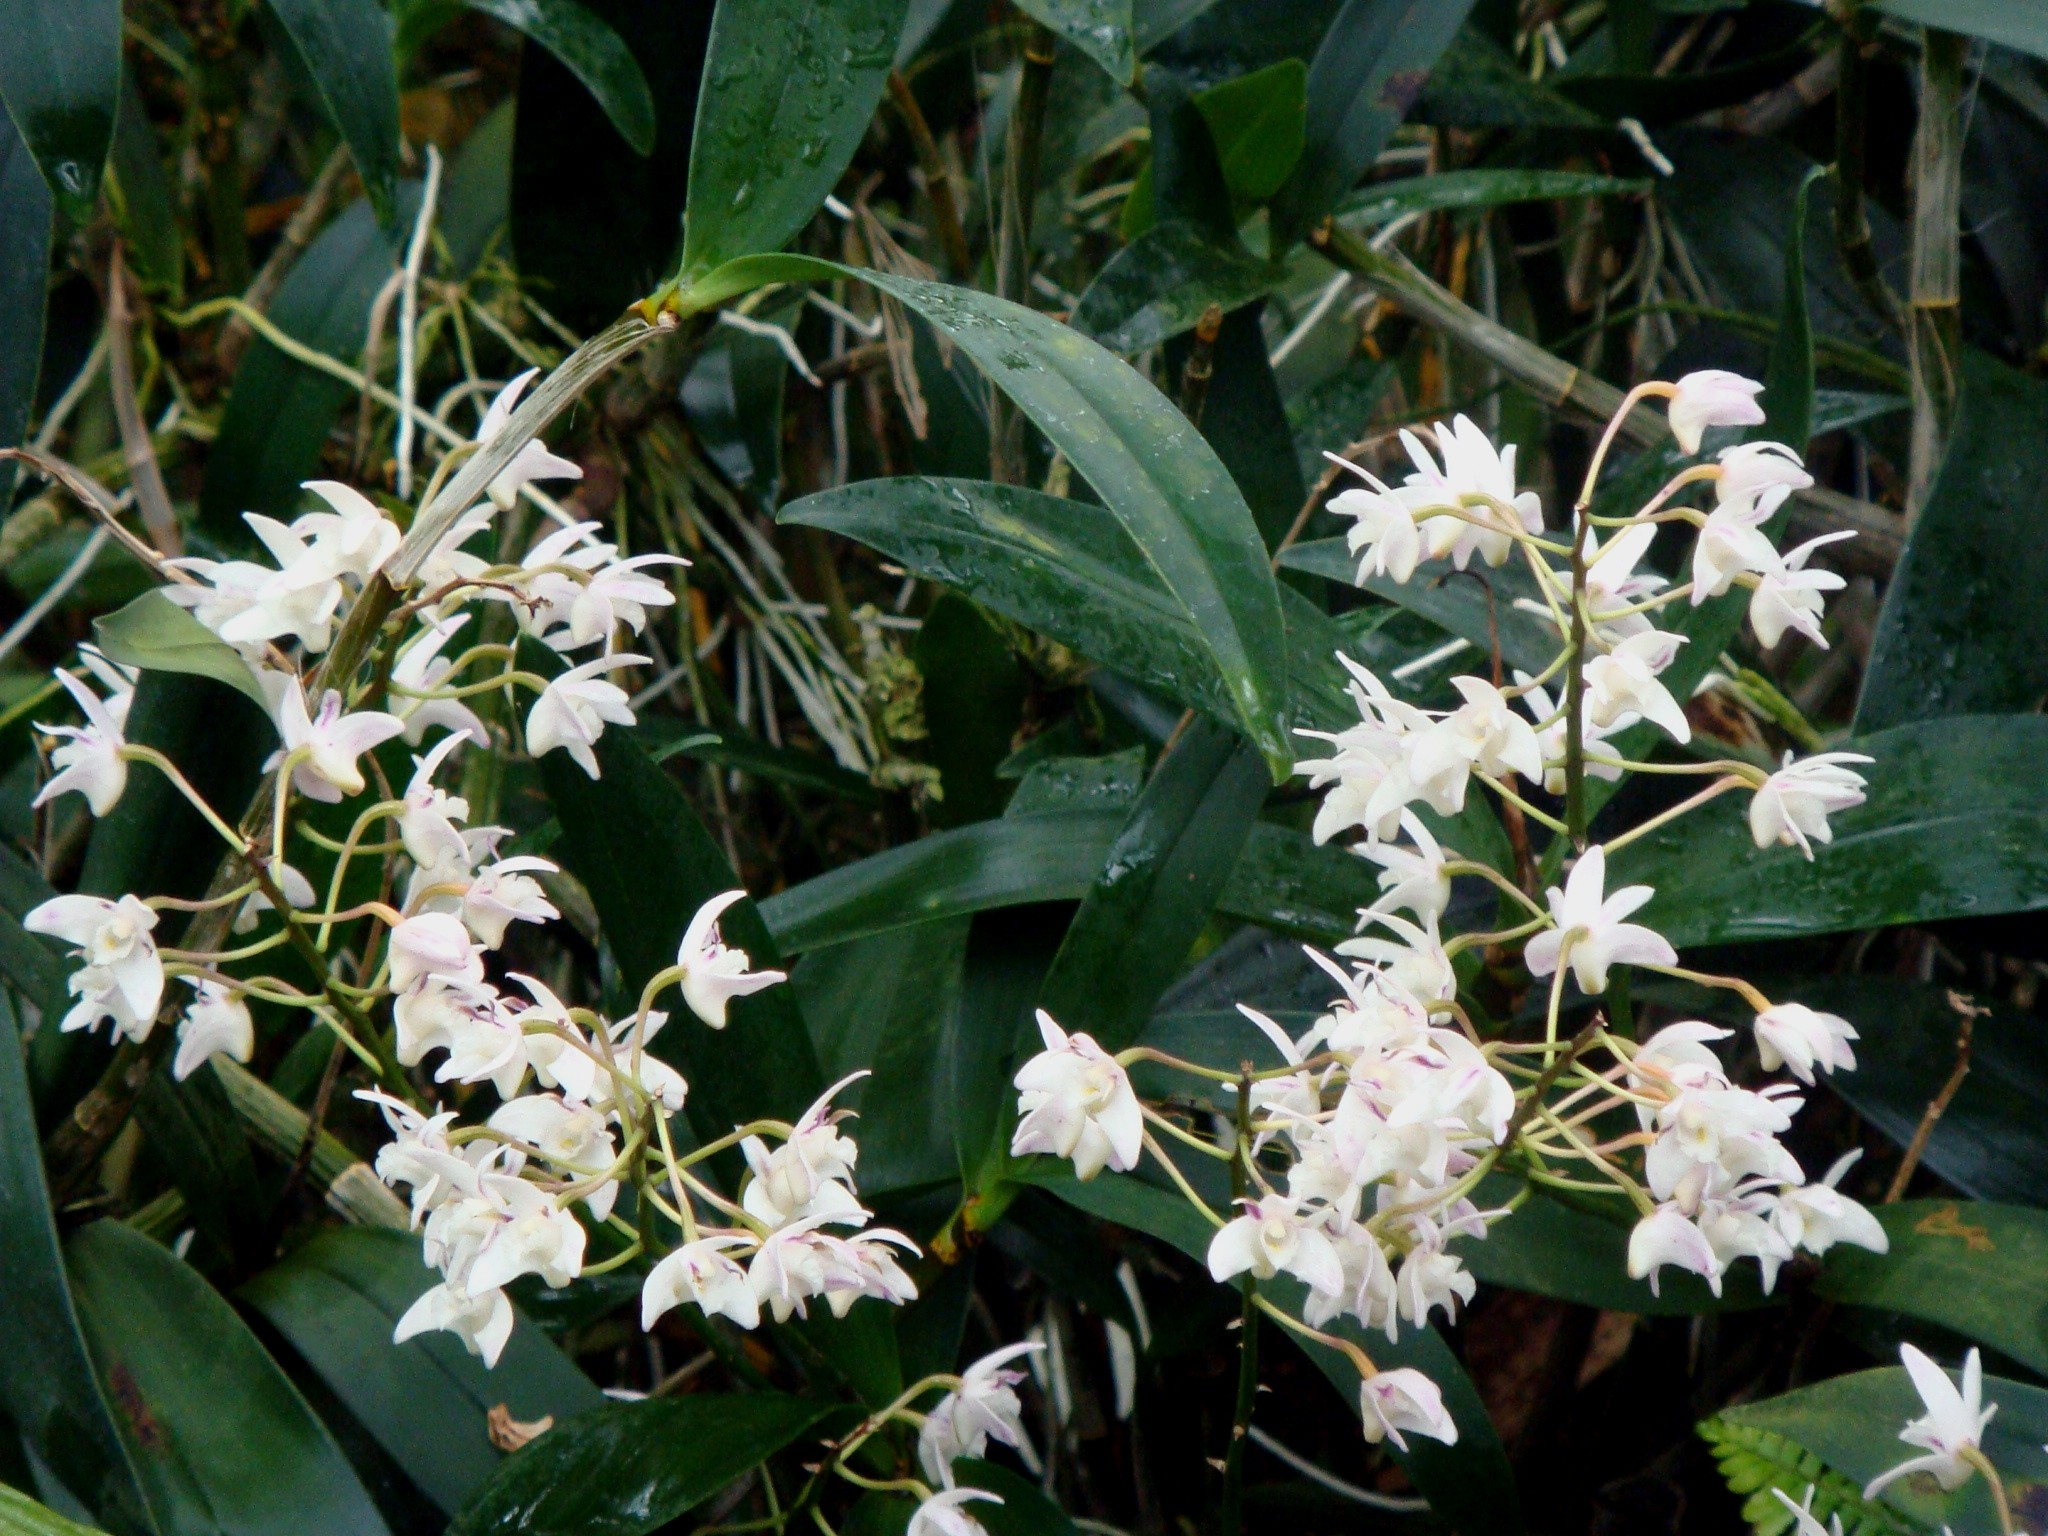 http://orchids.la.coocan.jp/Dendrobium/Dendrobium%20x%20delicatum/DSC08919.JPG